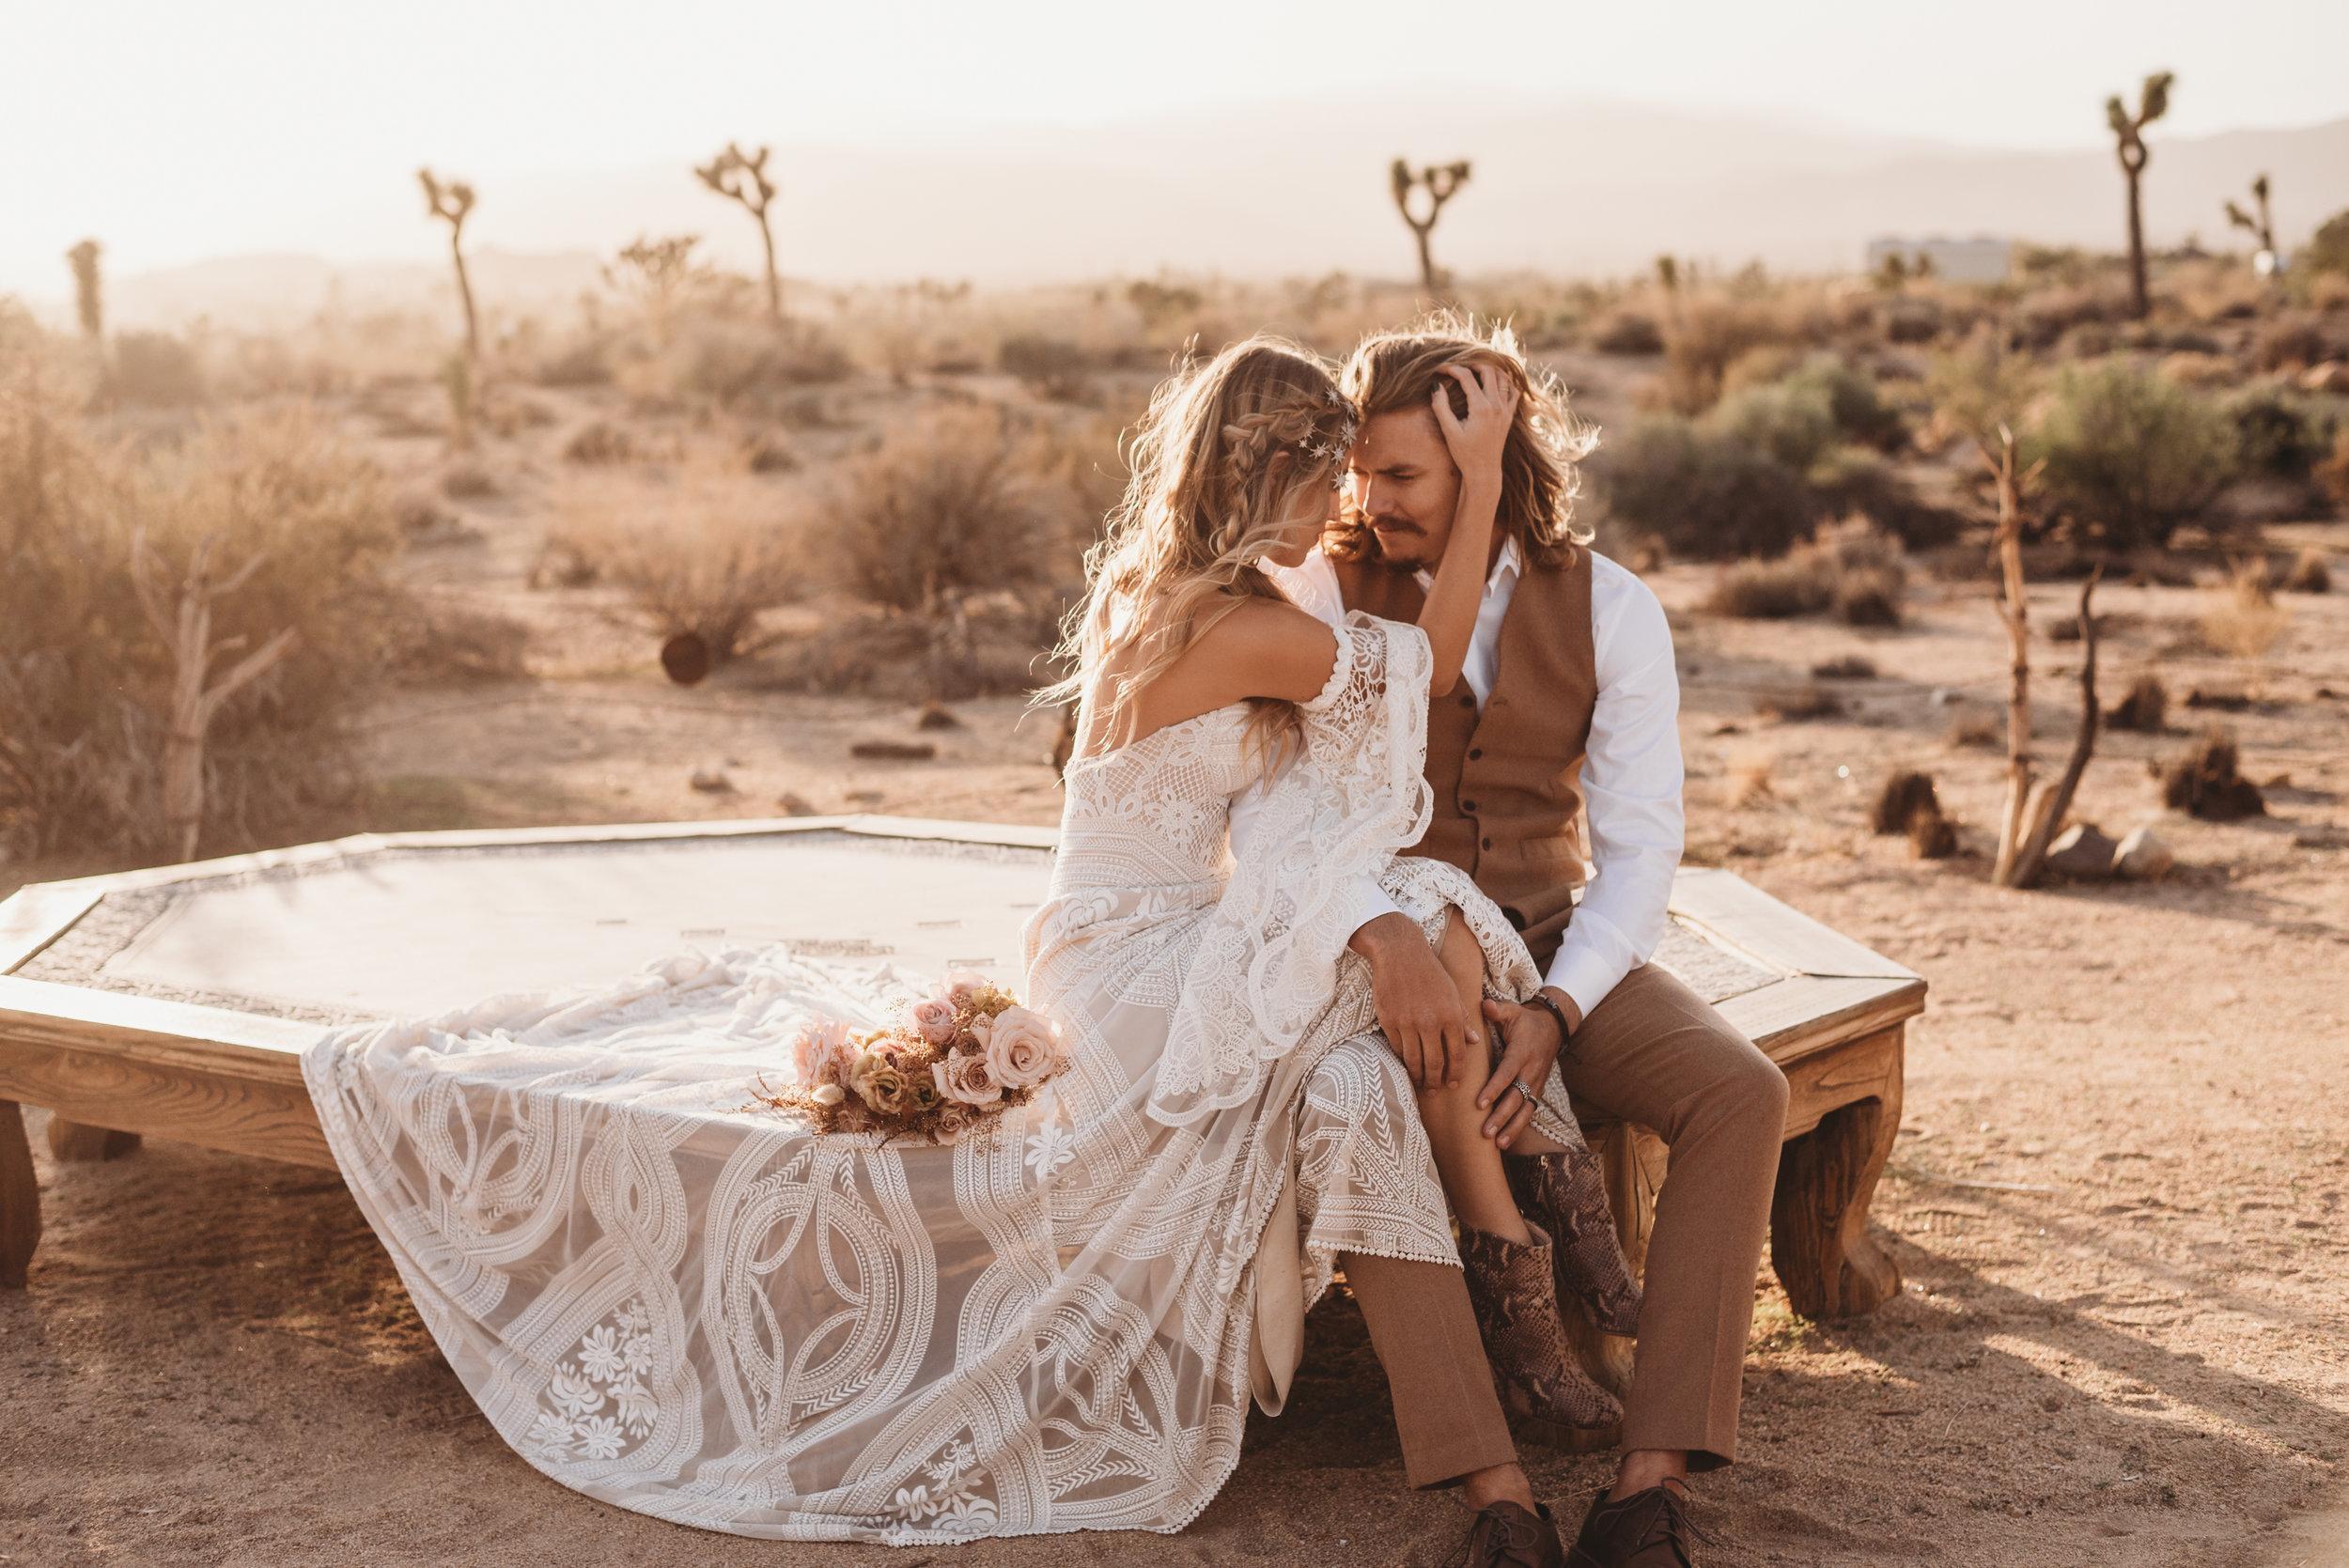 FortSt.John_photographer_TyraEPhotography_Wedding_Couple_Family_Photograhy_DawsonCreek_Elopement_Bride_Boduoir_Portraits-8104.jpg